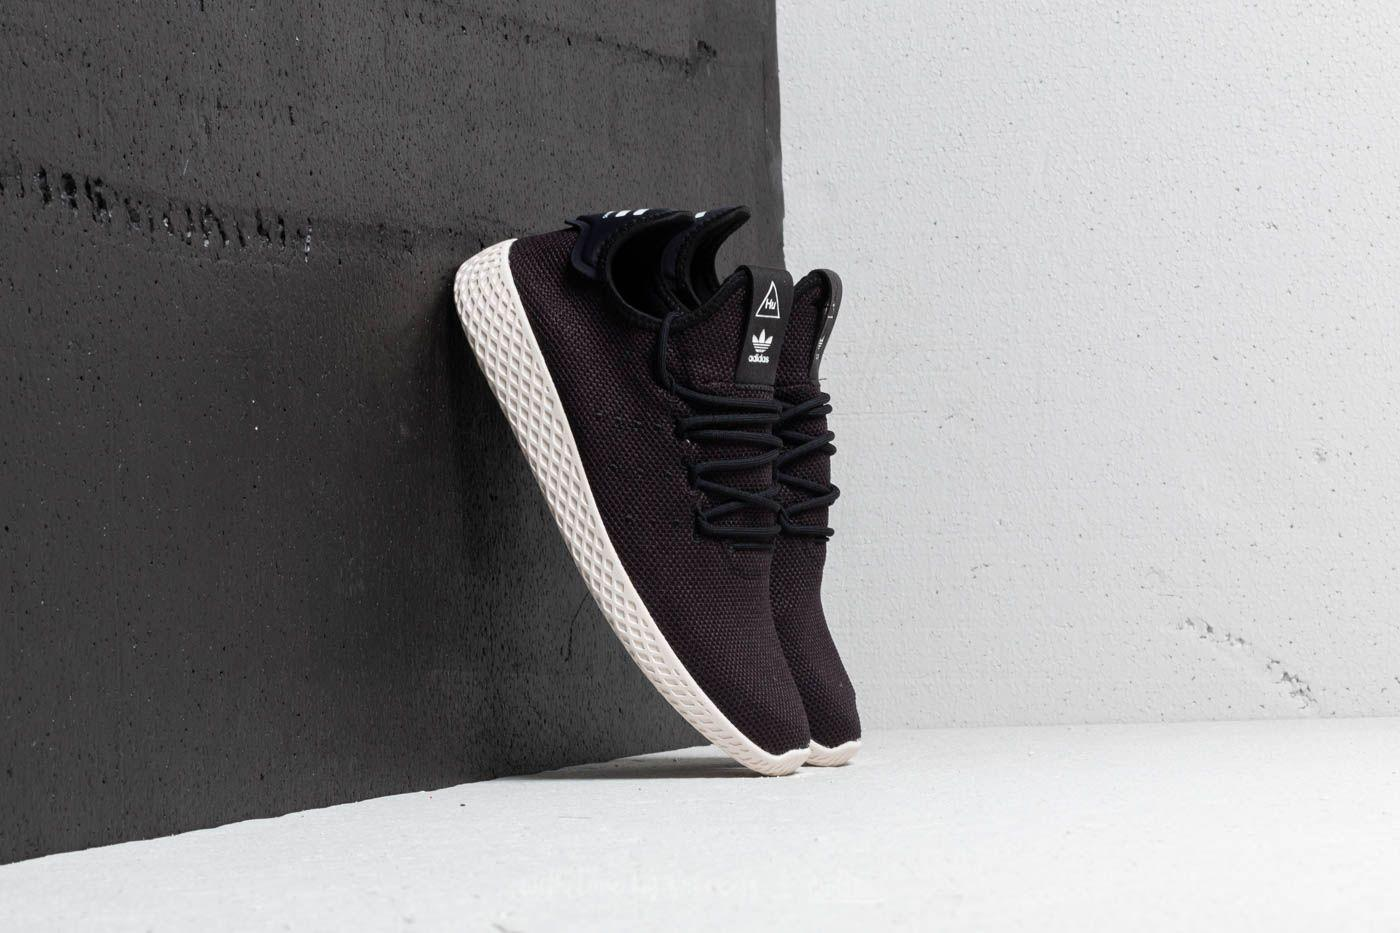 premium selection de49e 431c0 Lyst - adidas Originals Adidas Pw Tennis Hu Core Black Core